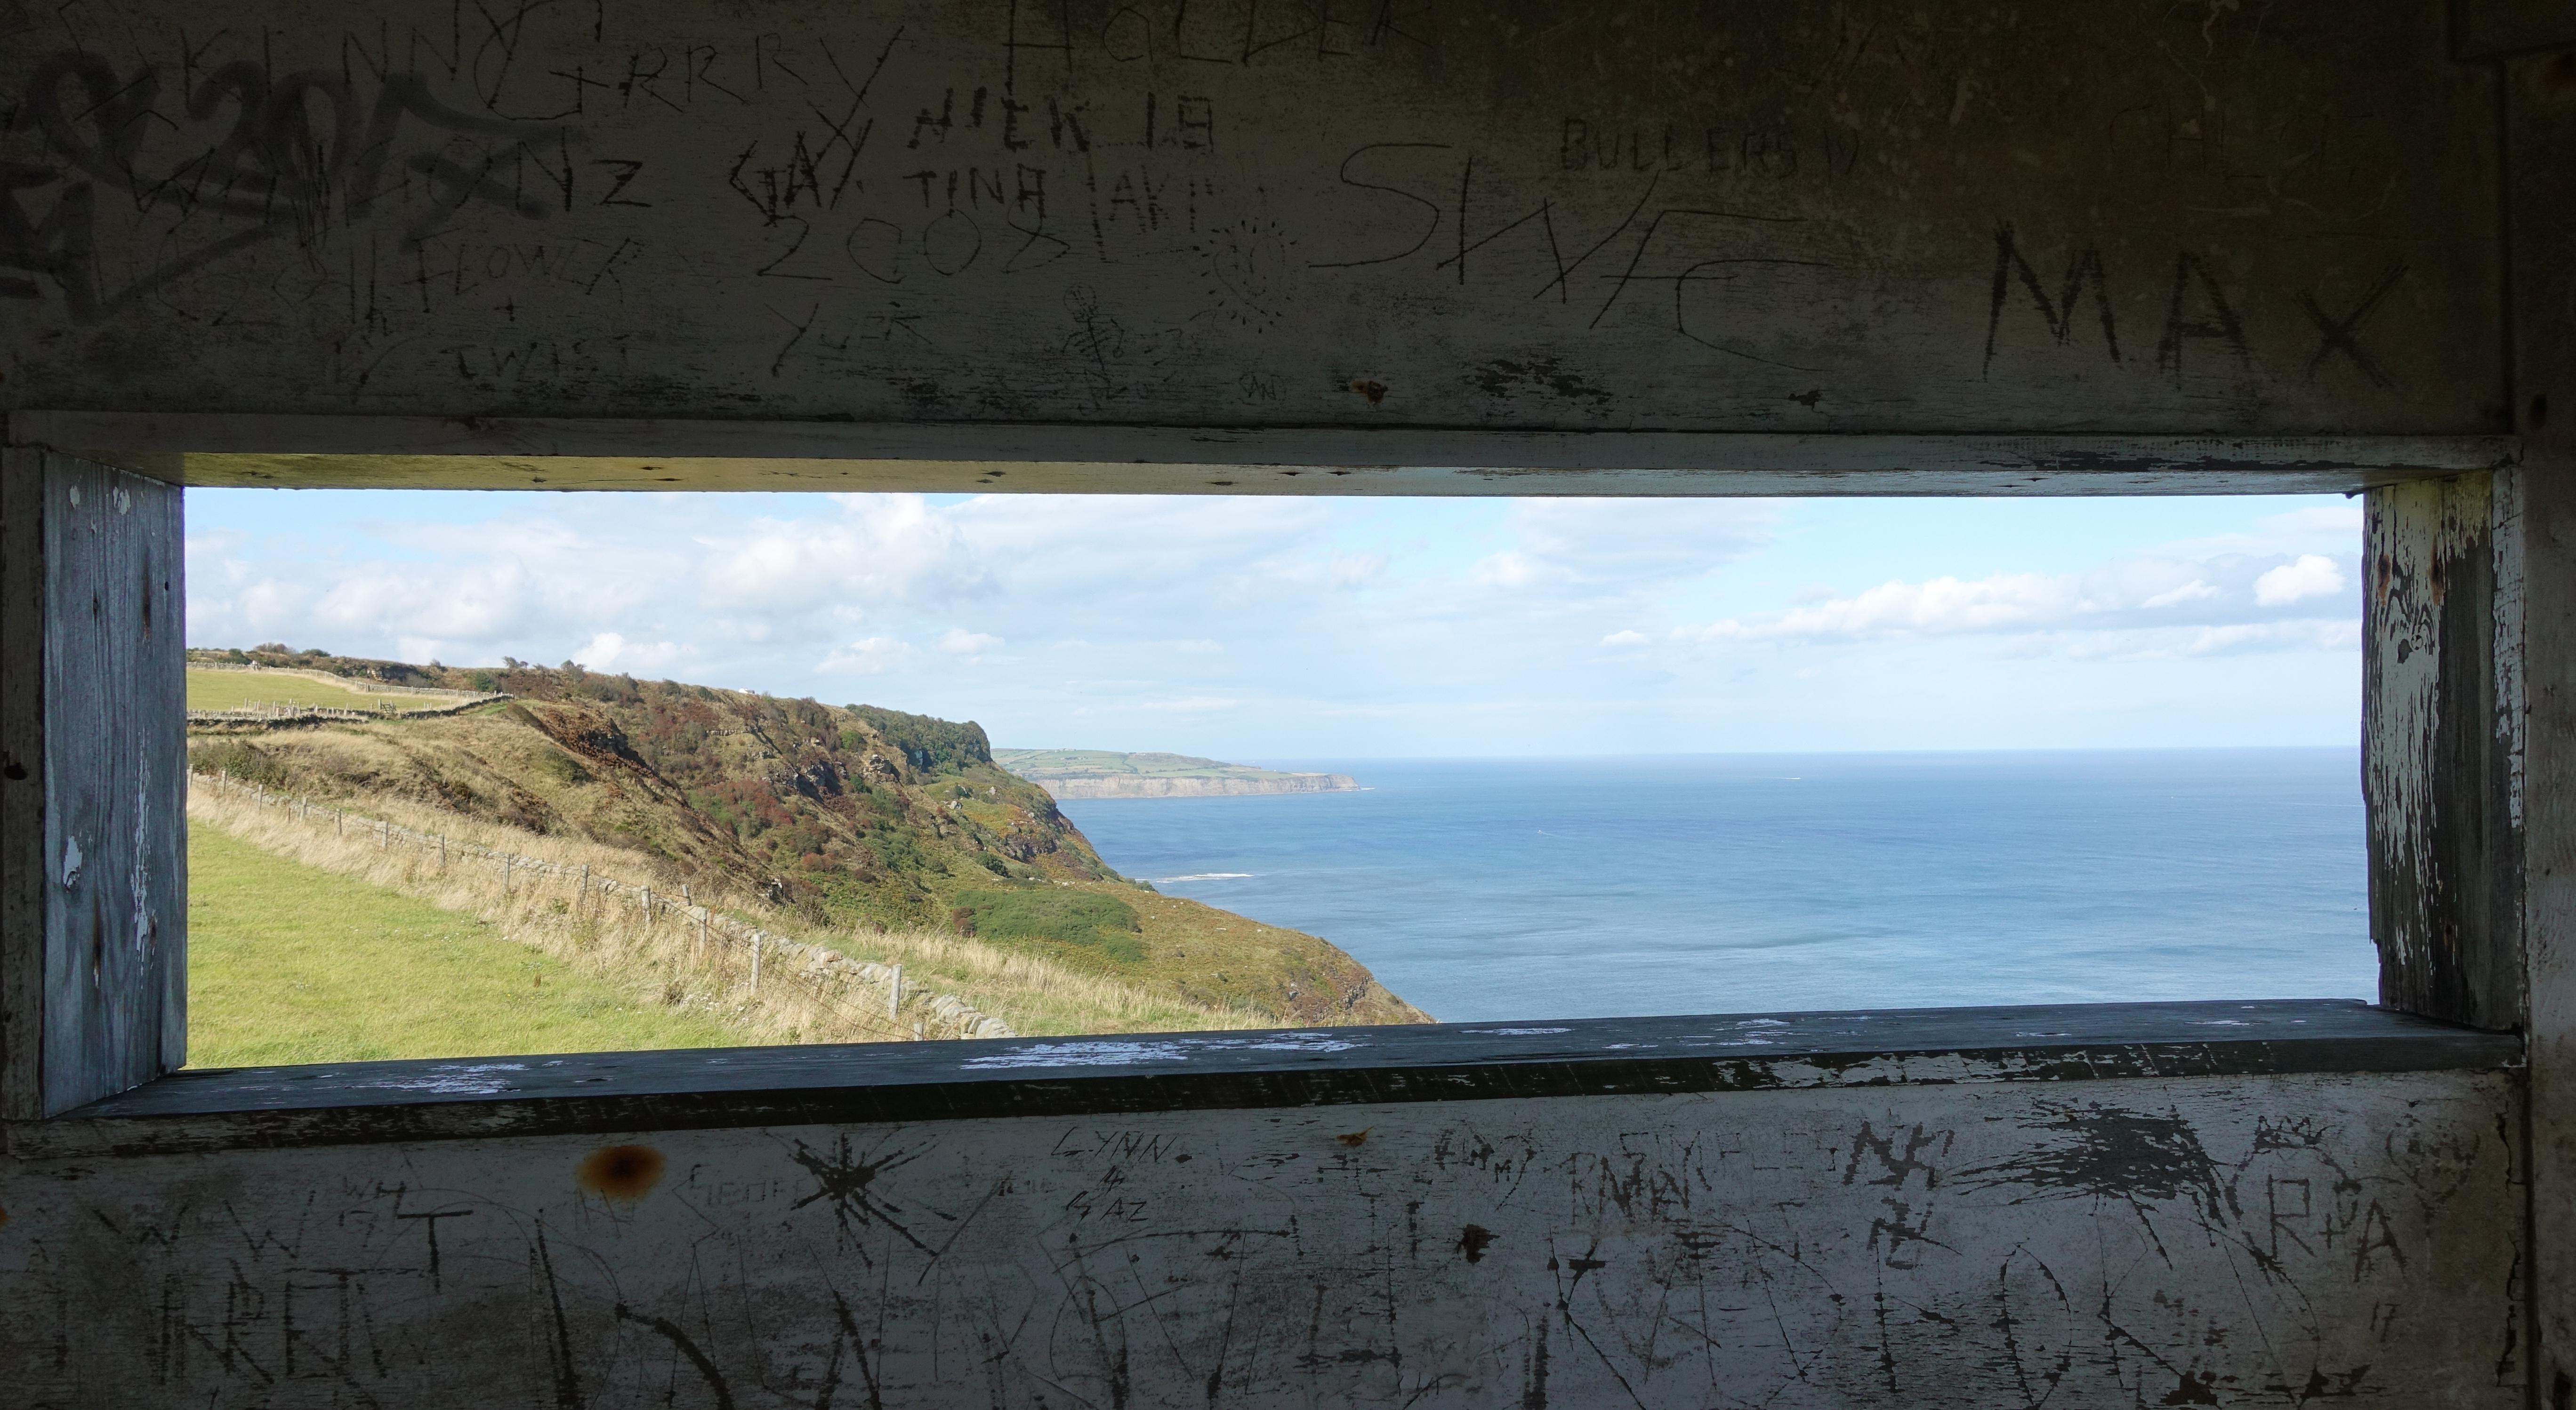 Visiting the disused Coastguard Lookout station near the World War II Ravenscar Radar Station